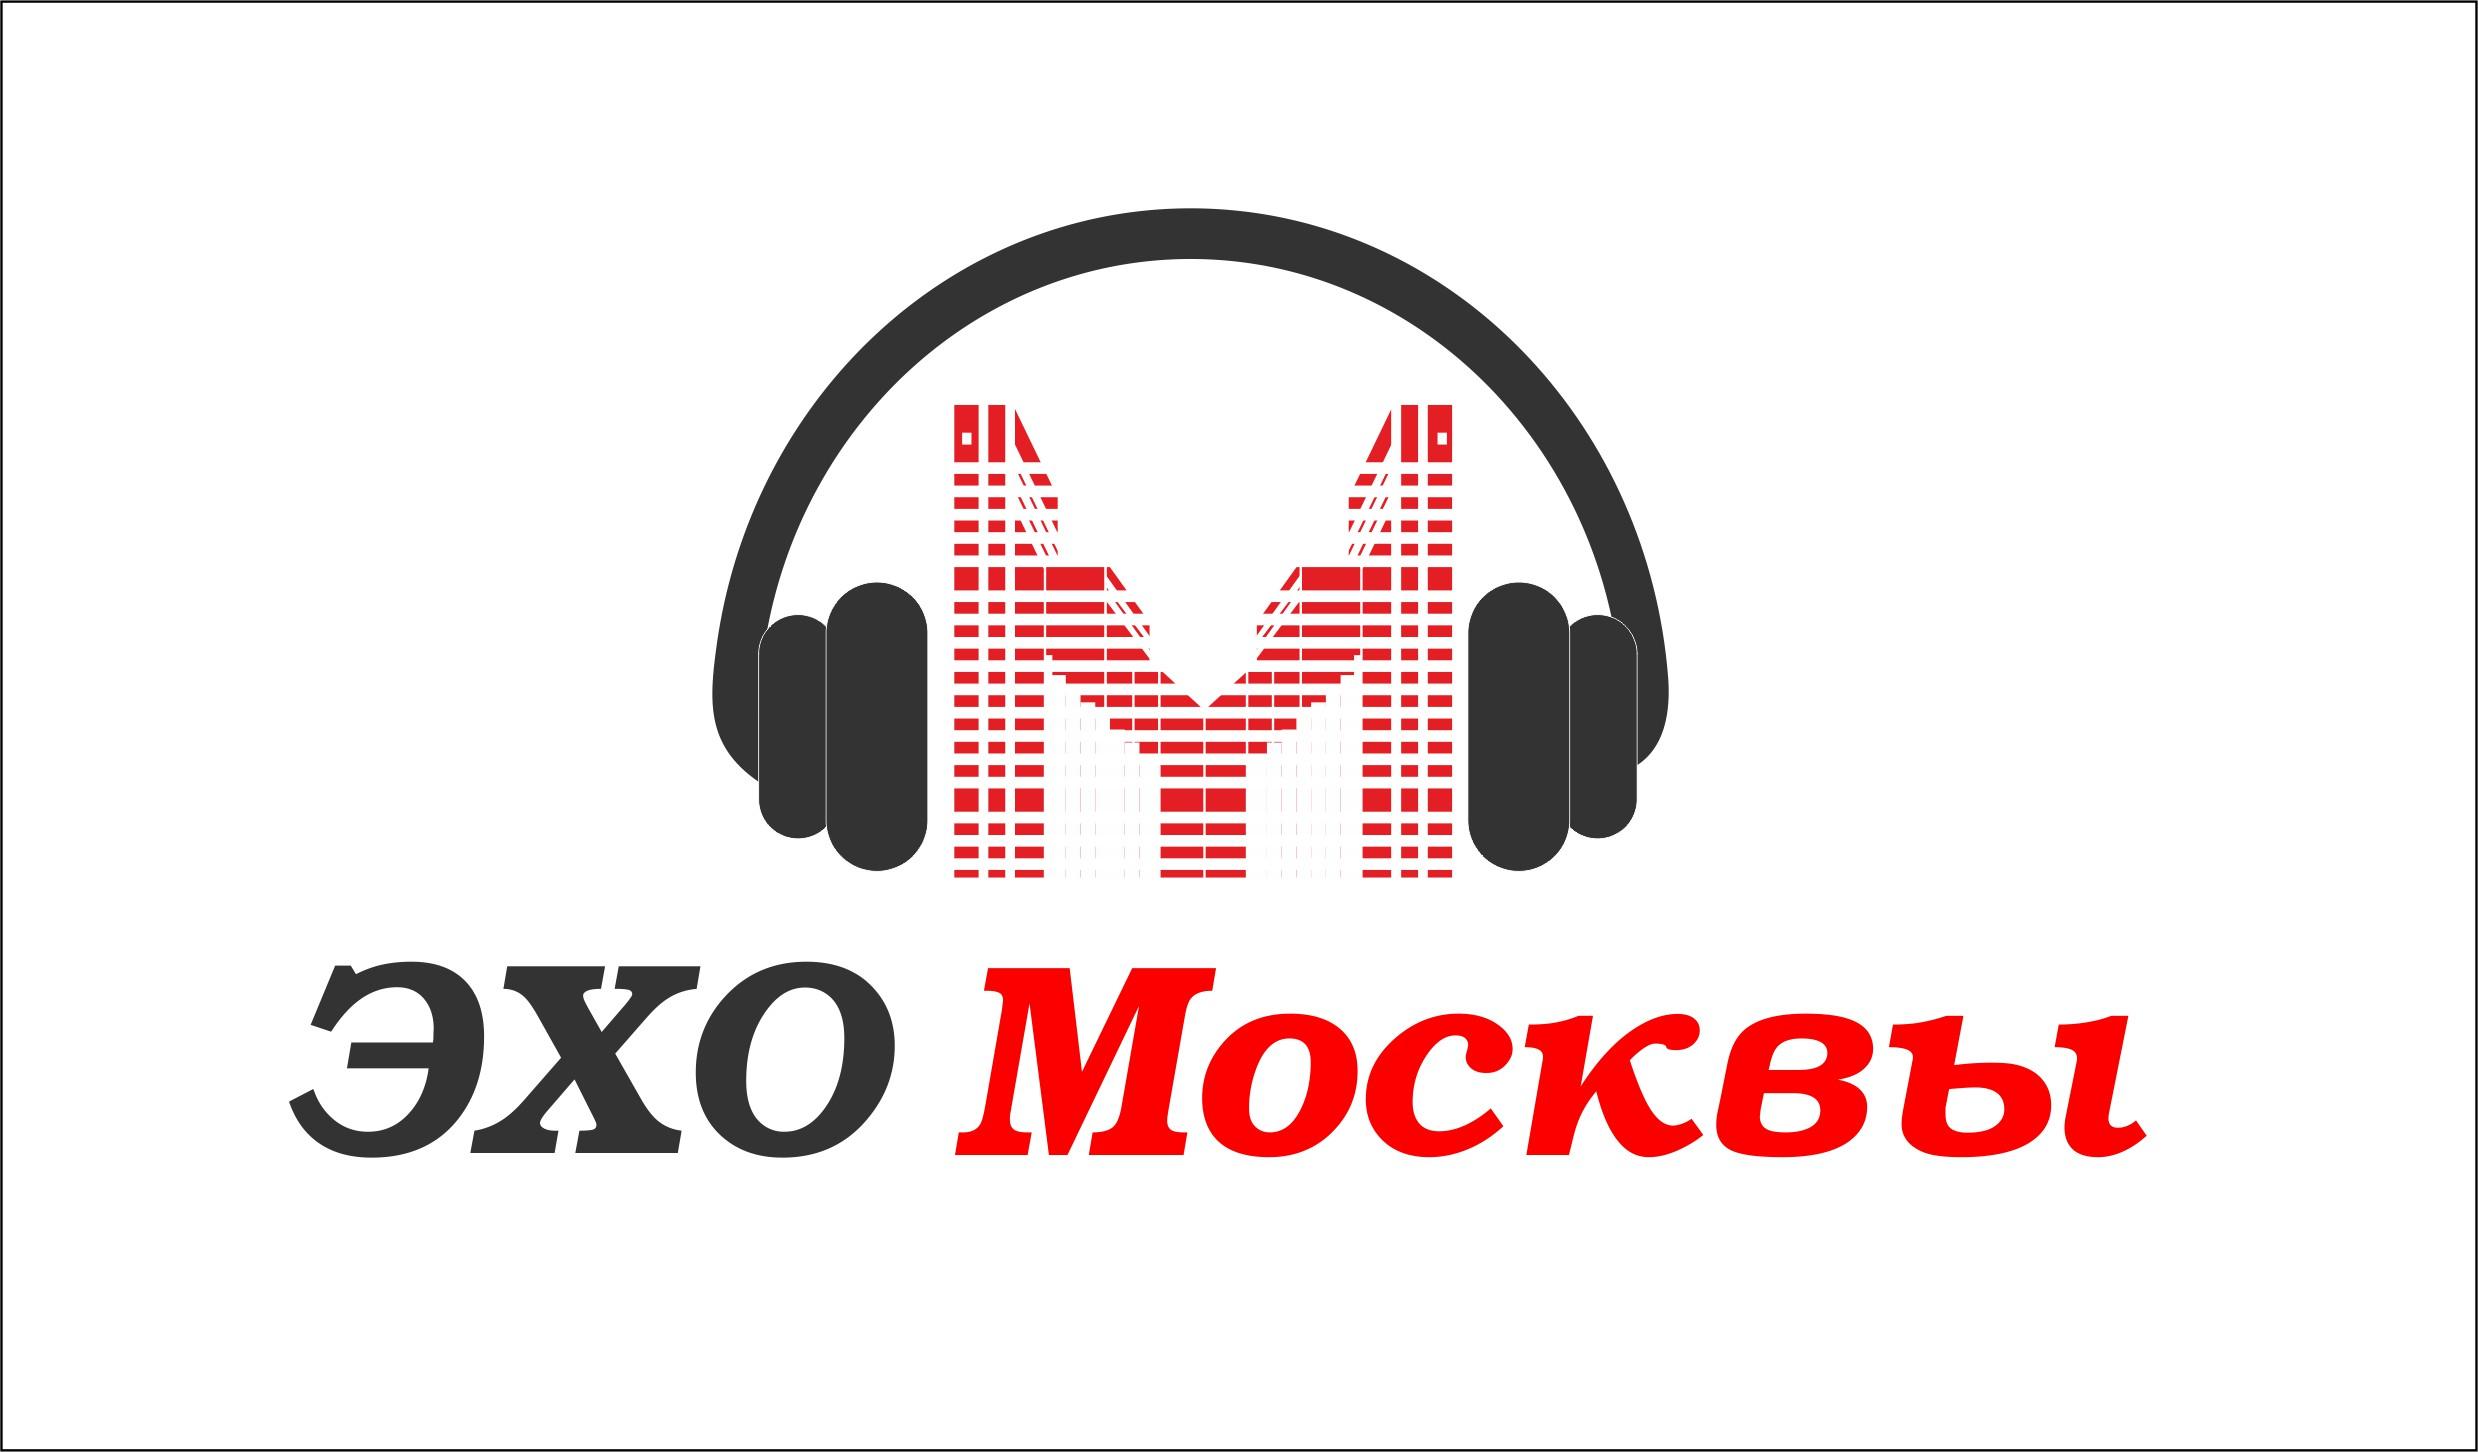 Дизайн логотипа р/с Эхо Москвы. фото f_4175625cbf94be94.jpg